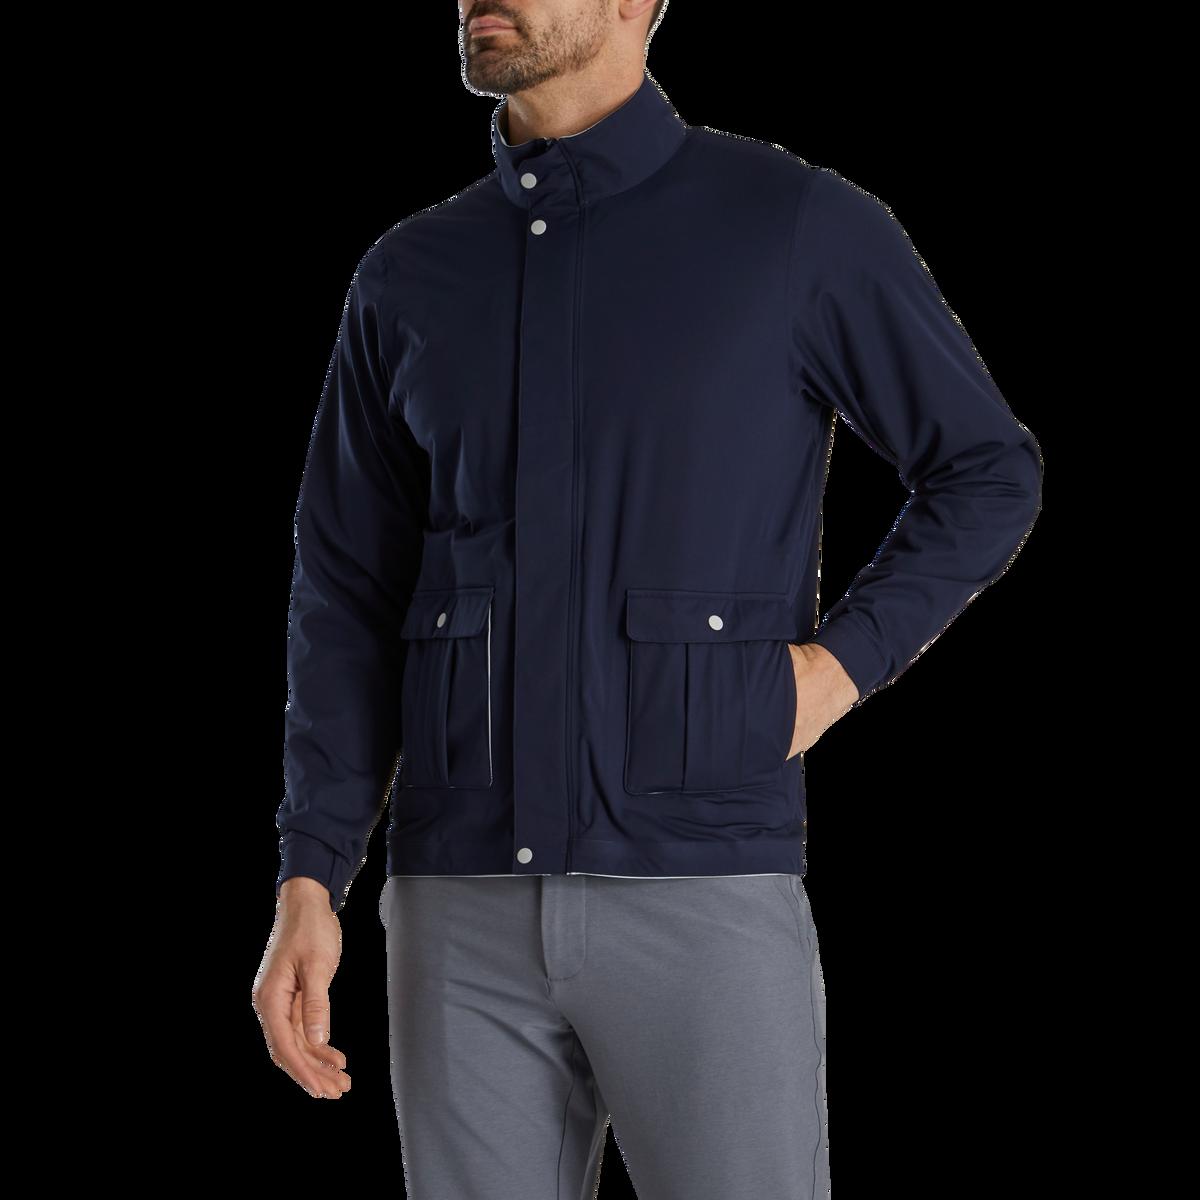 HydroVerse Jacket